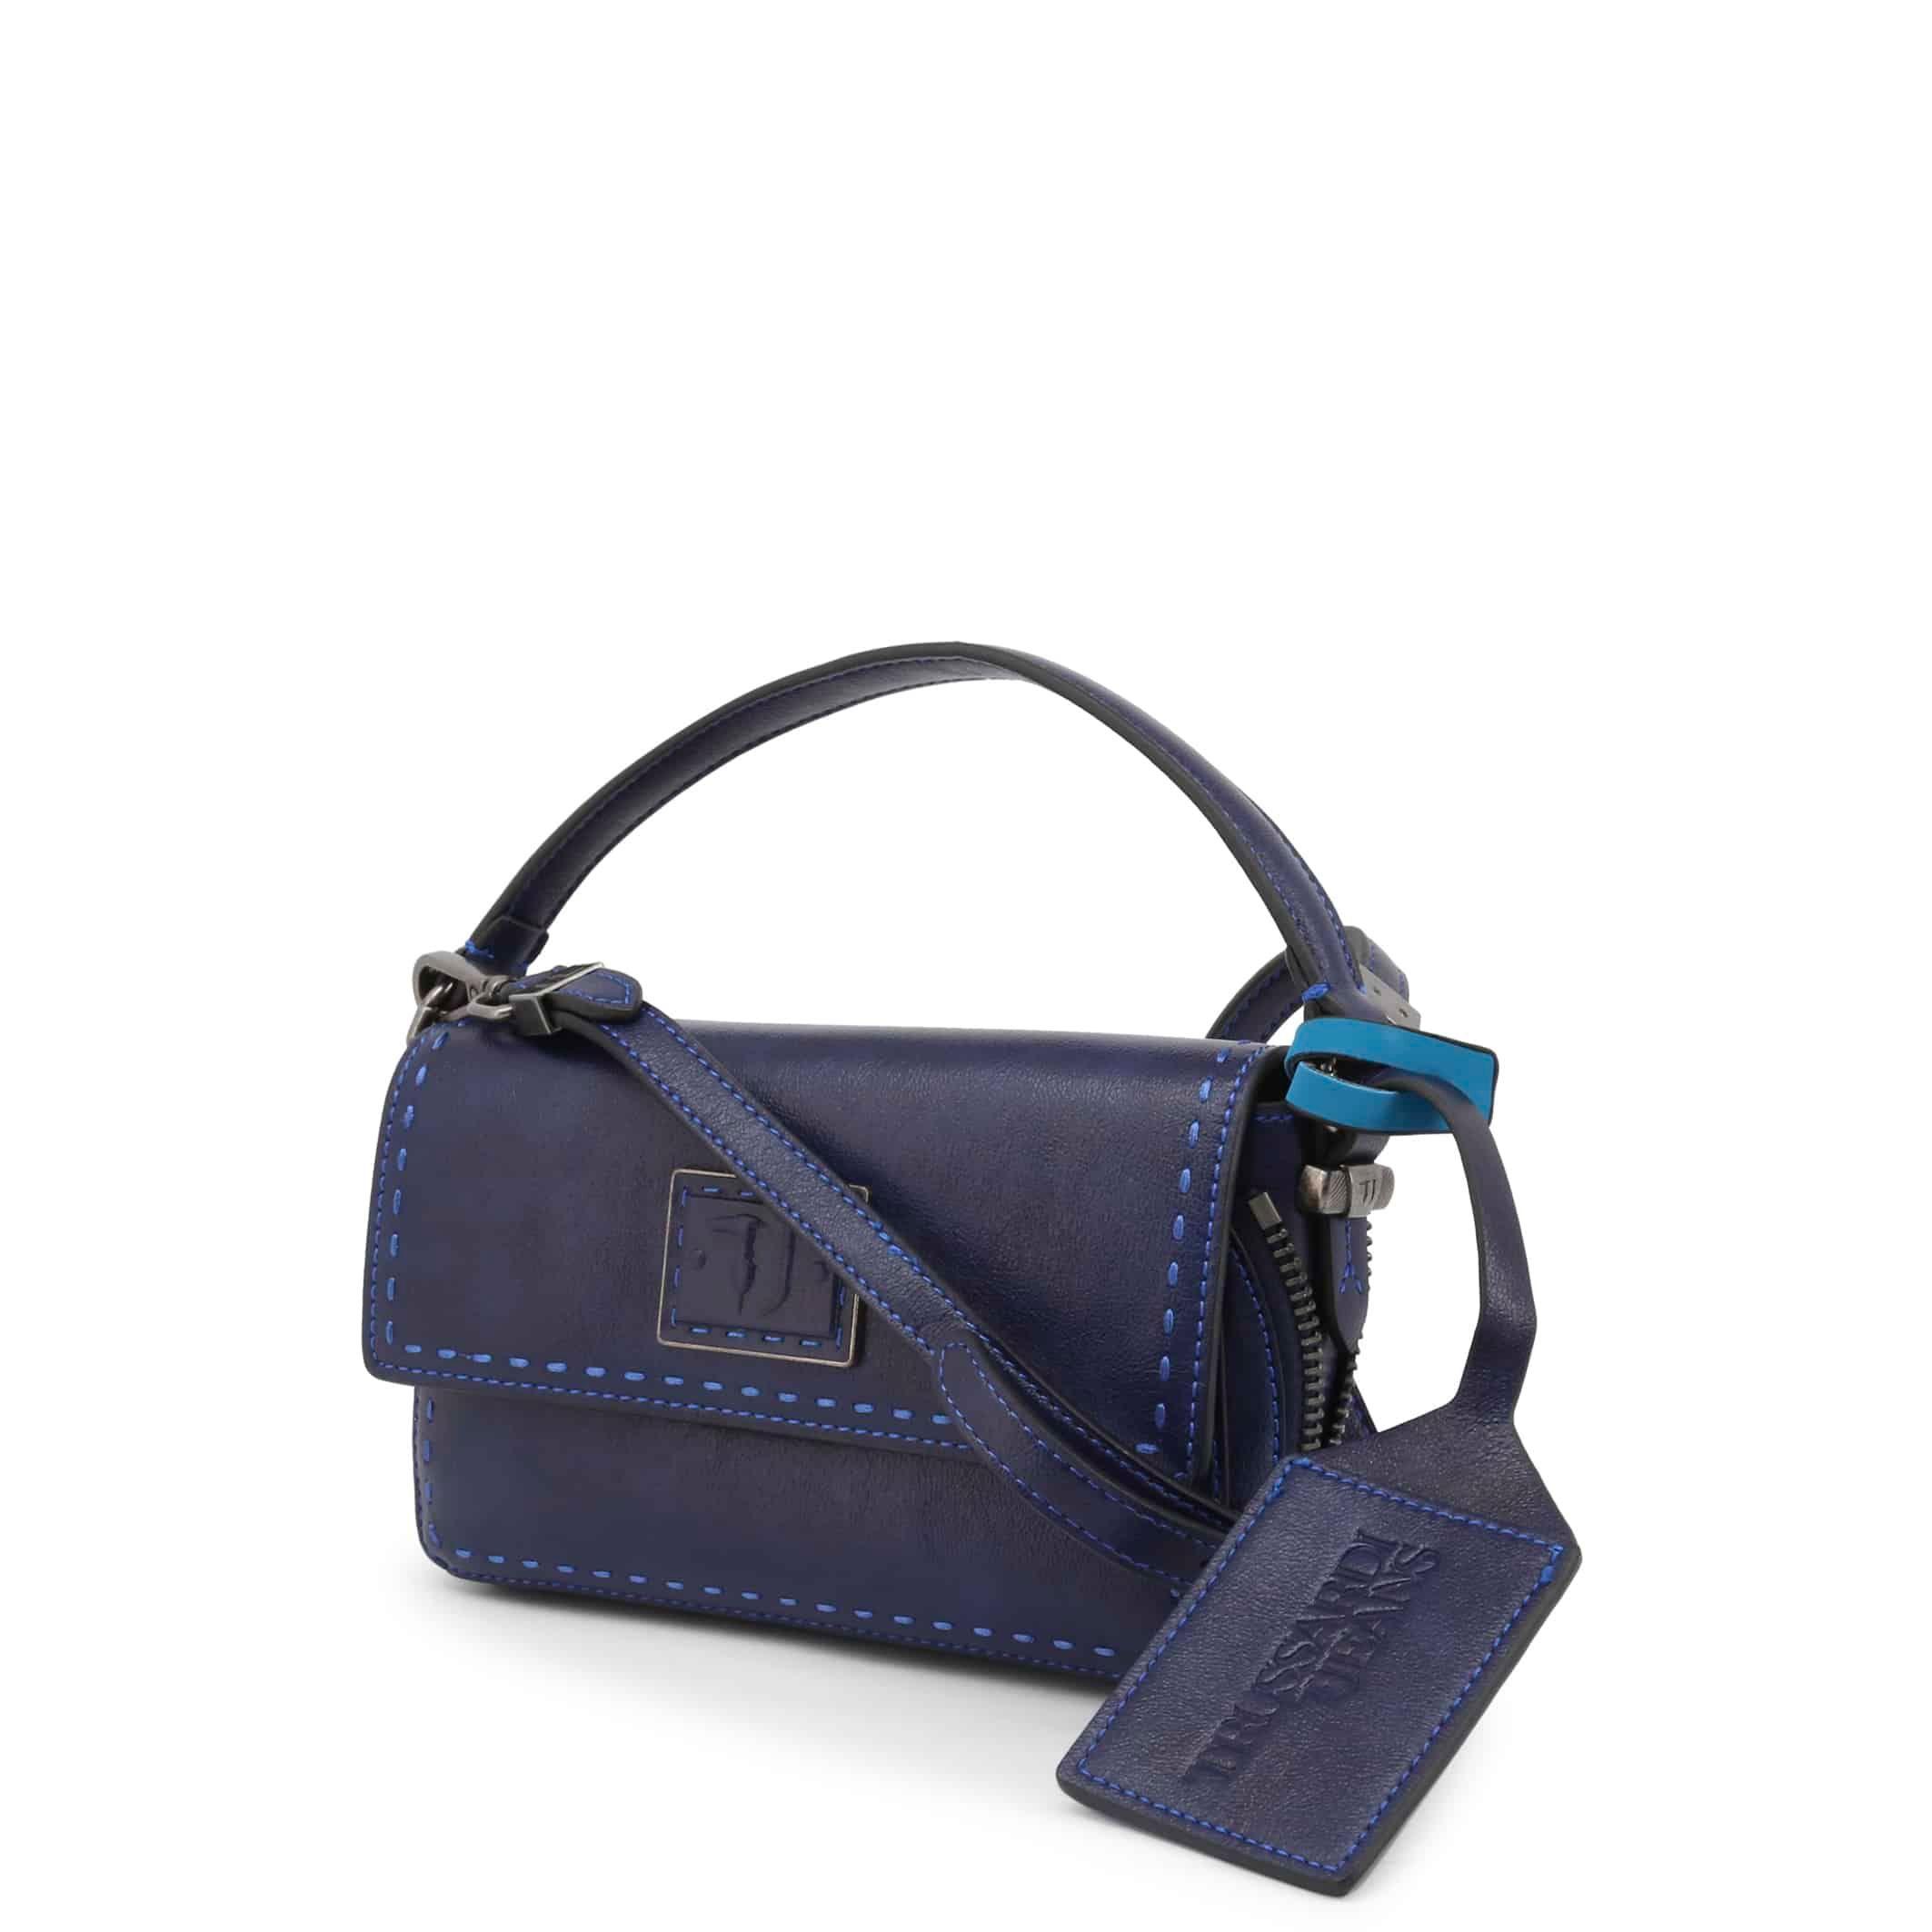 Trussardi - ZENZERO_75B00497-99 | You Fashion Outlet